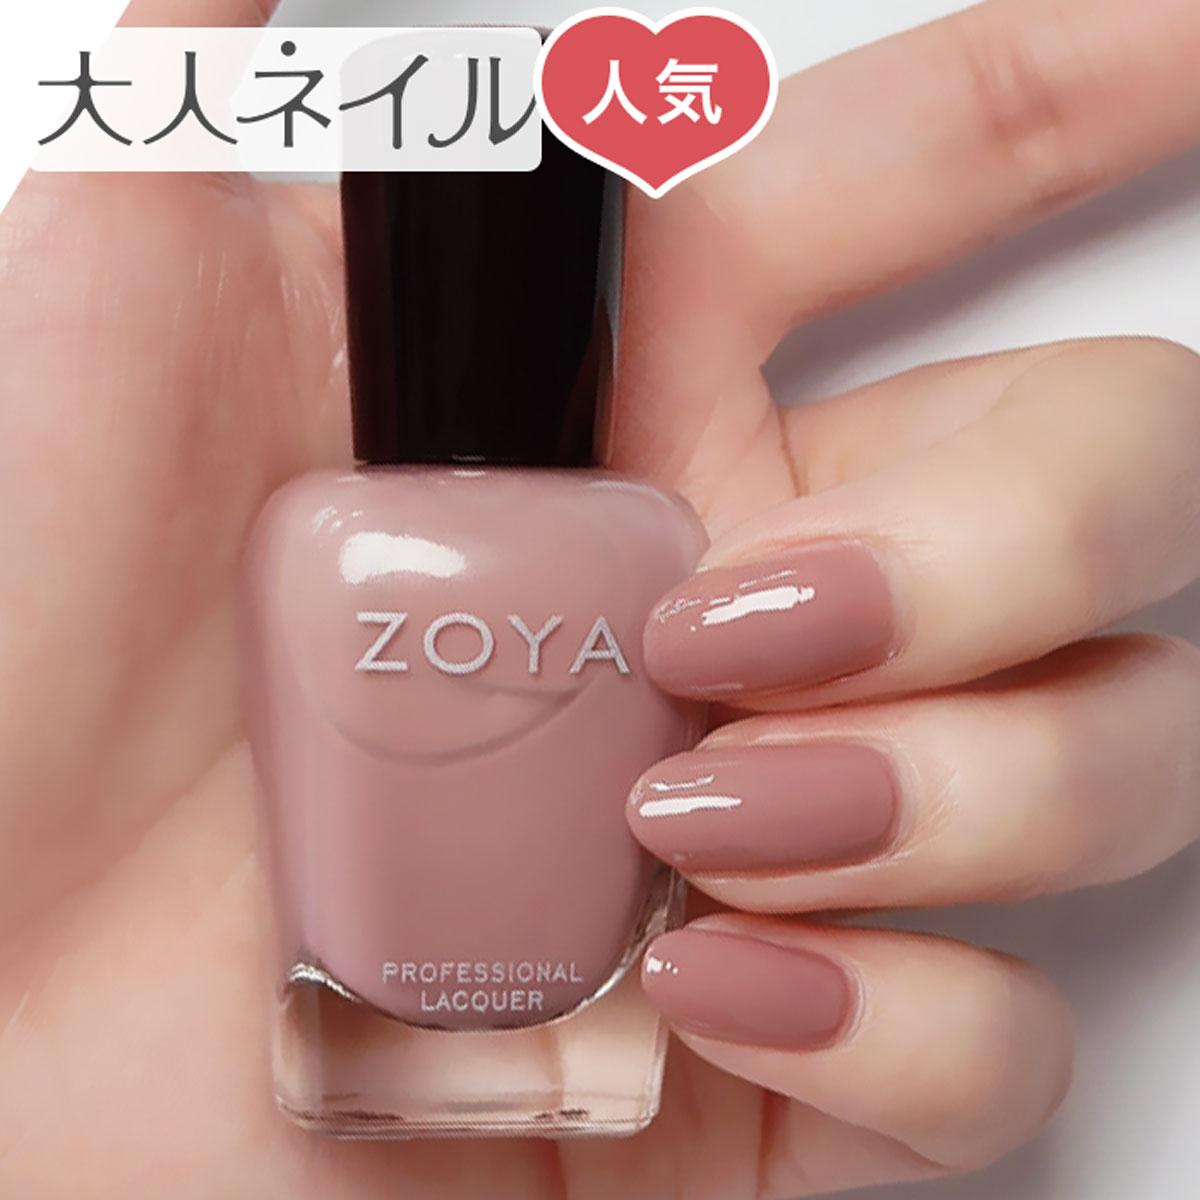 ZOYA ゾーヤ ゾヤ ネイルカラー ZP707 15mL  BRIGITTE ブリジット 自爪 の為に作られた ネイル にやさしい 自然派 マニキュア zoya セルフネイル にもおすすめ ヌード モーヴ オフィス